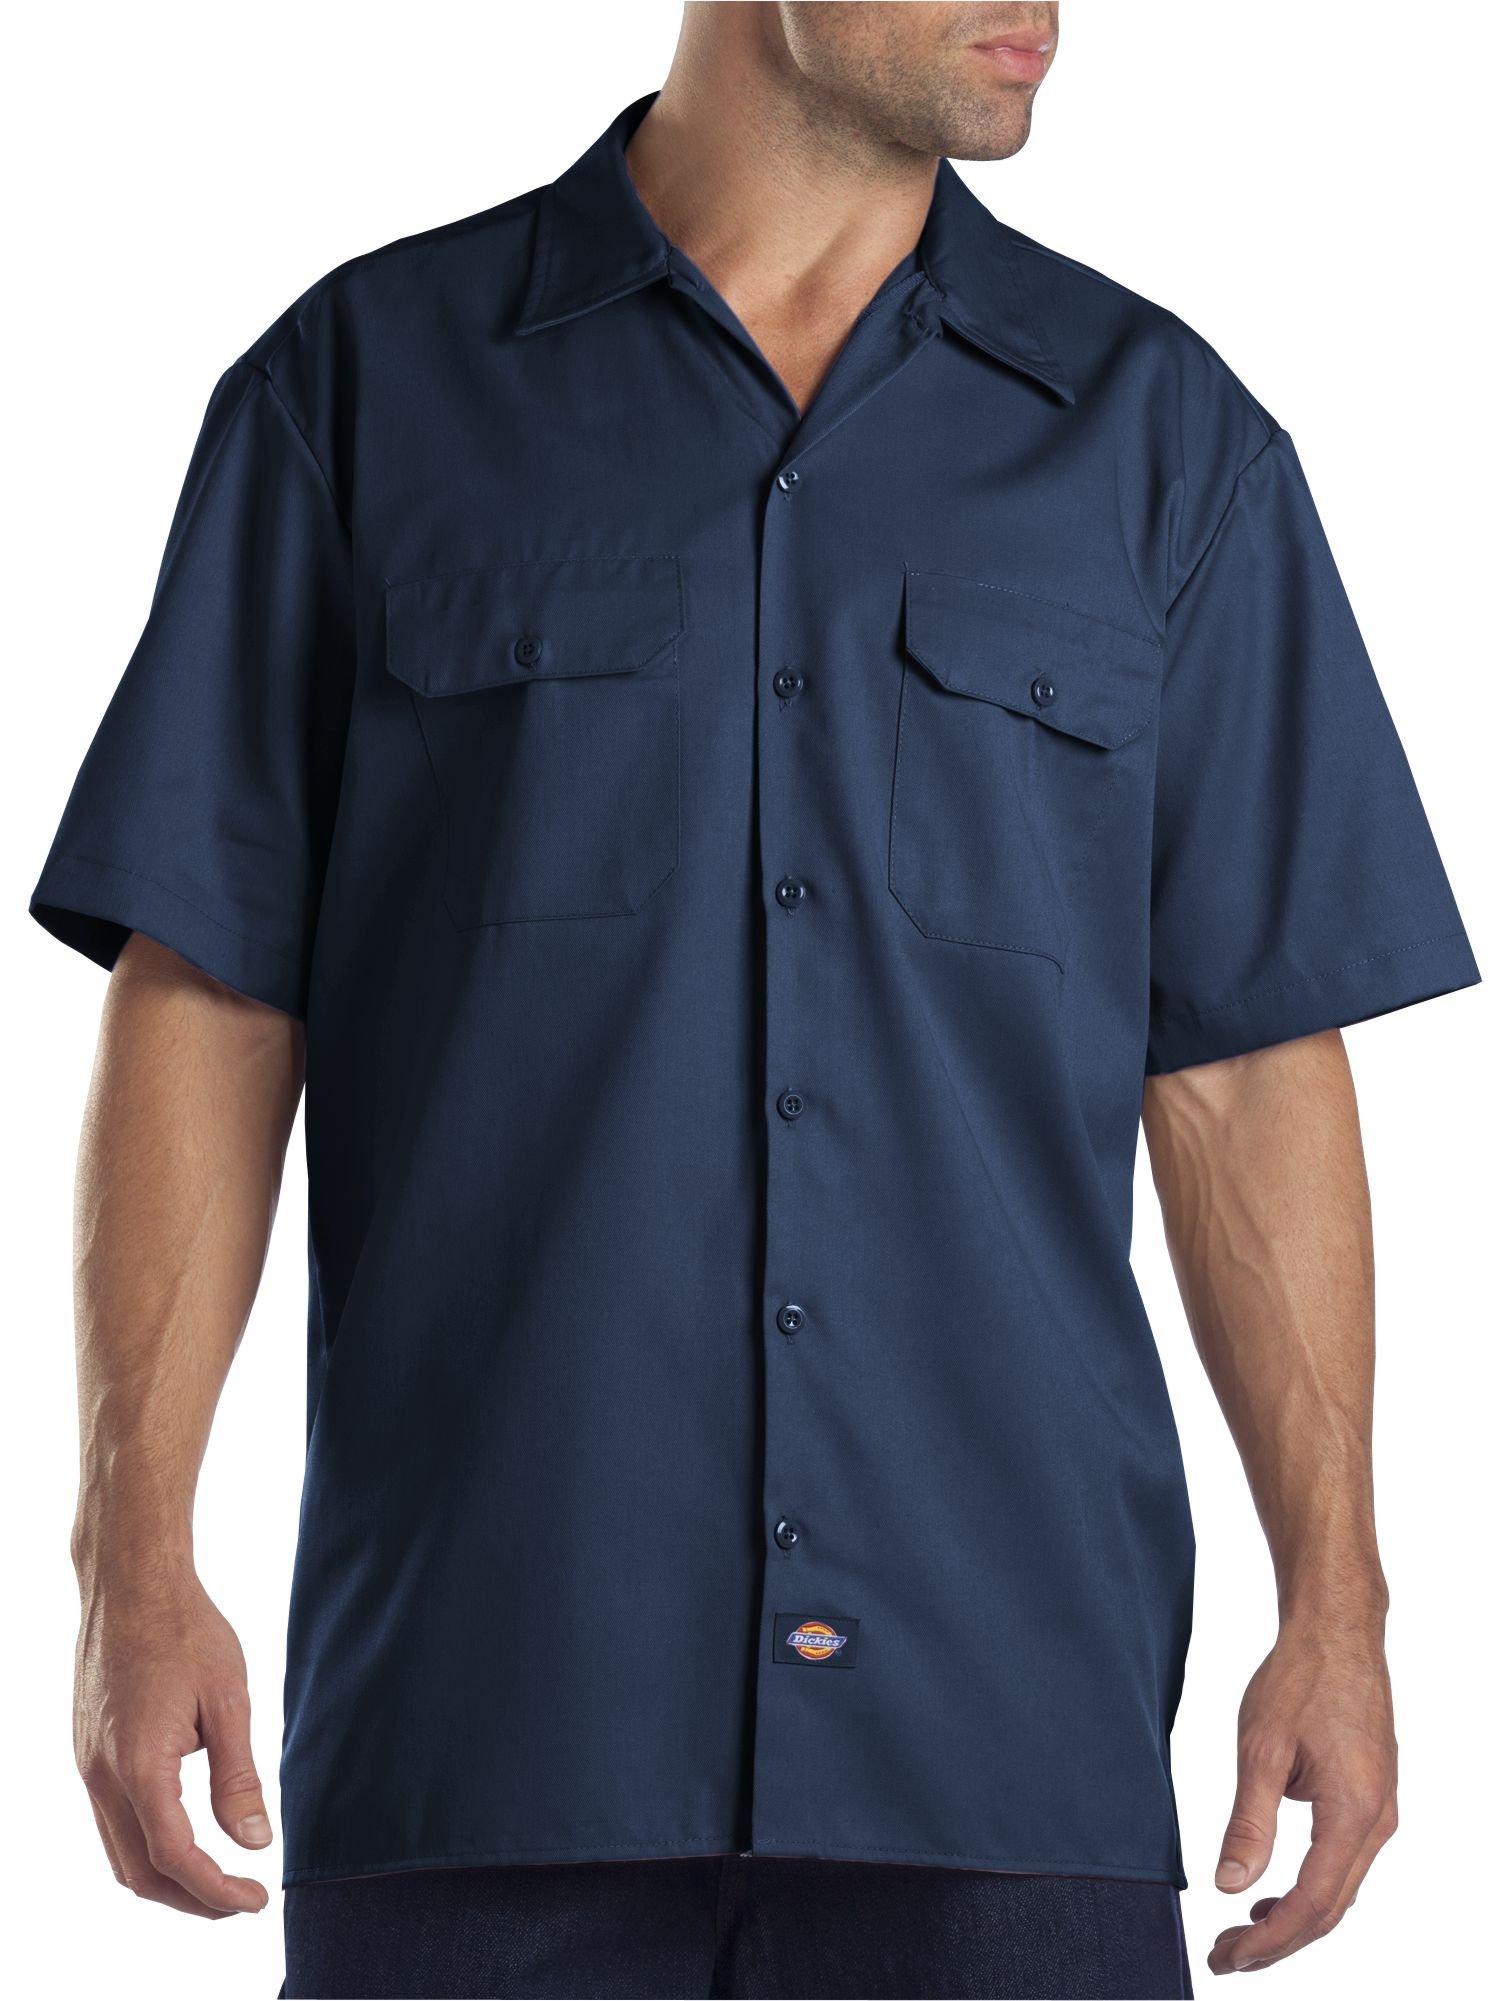 Dickies Men's Big-Tall Short-Sleeve Work Shirt,Navy,3X